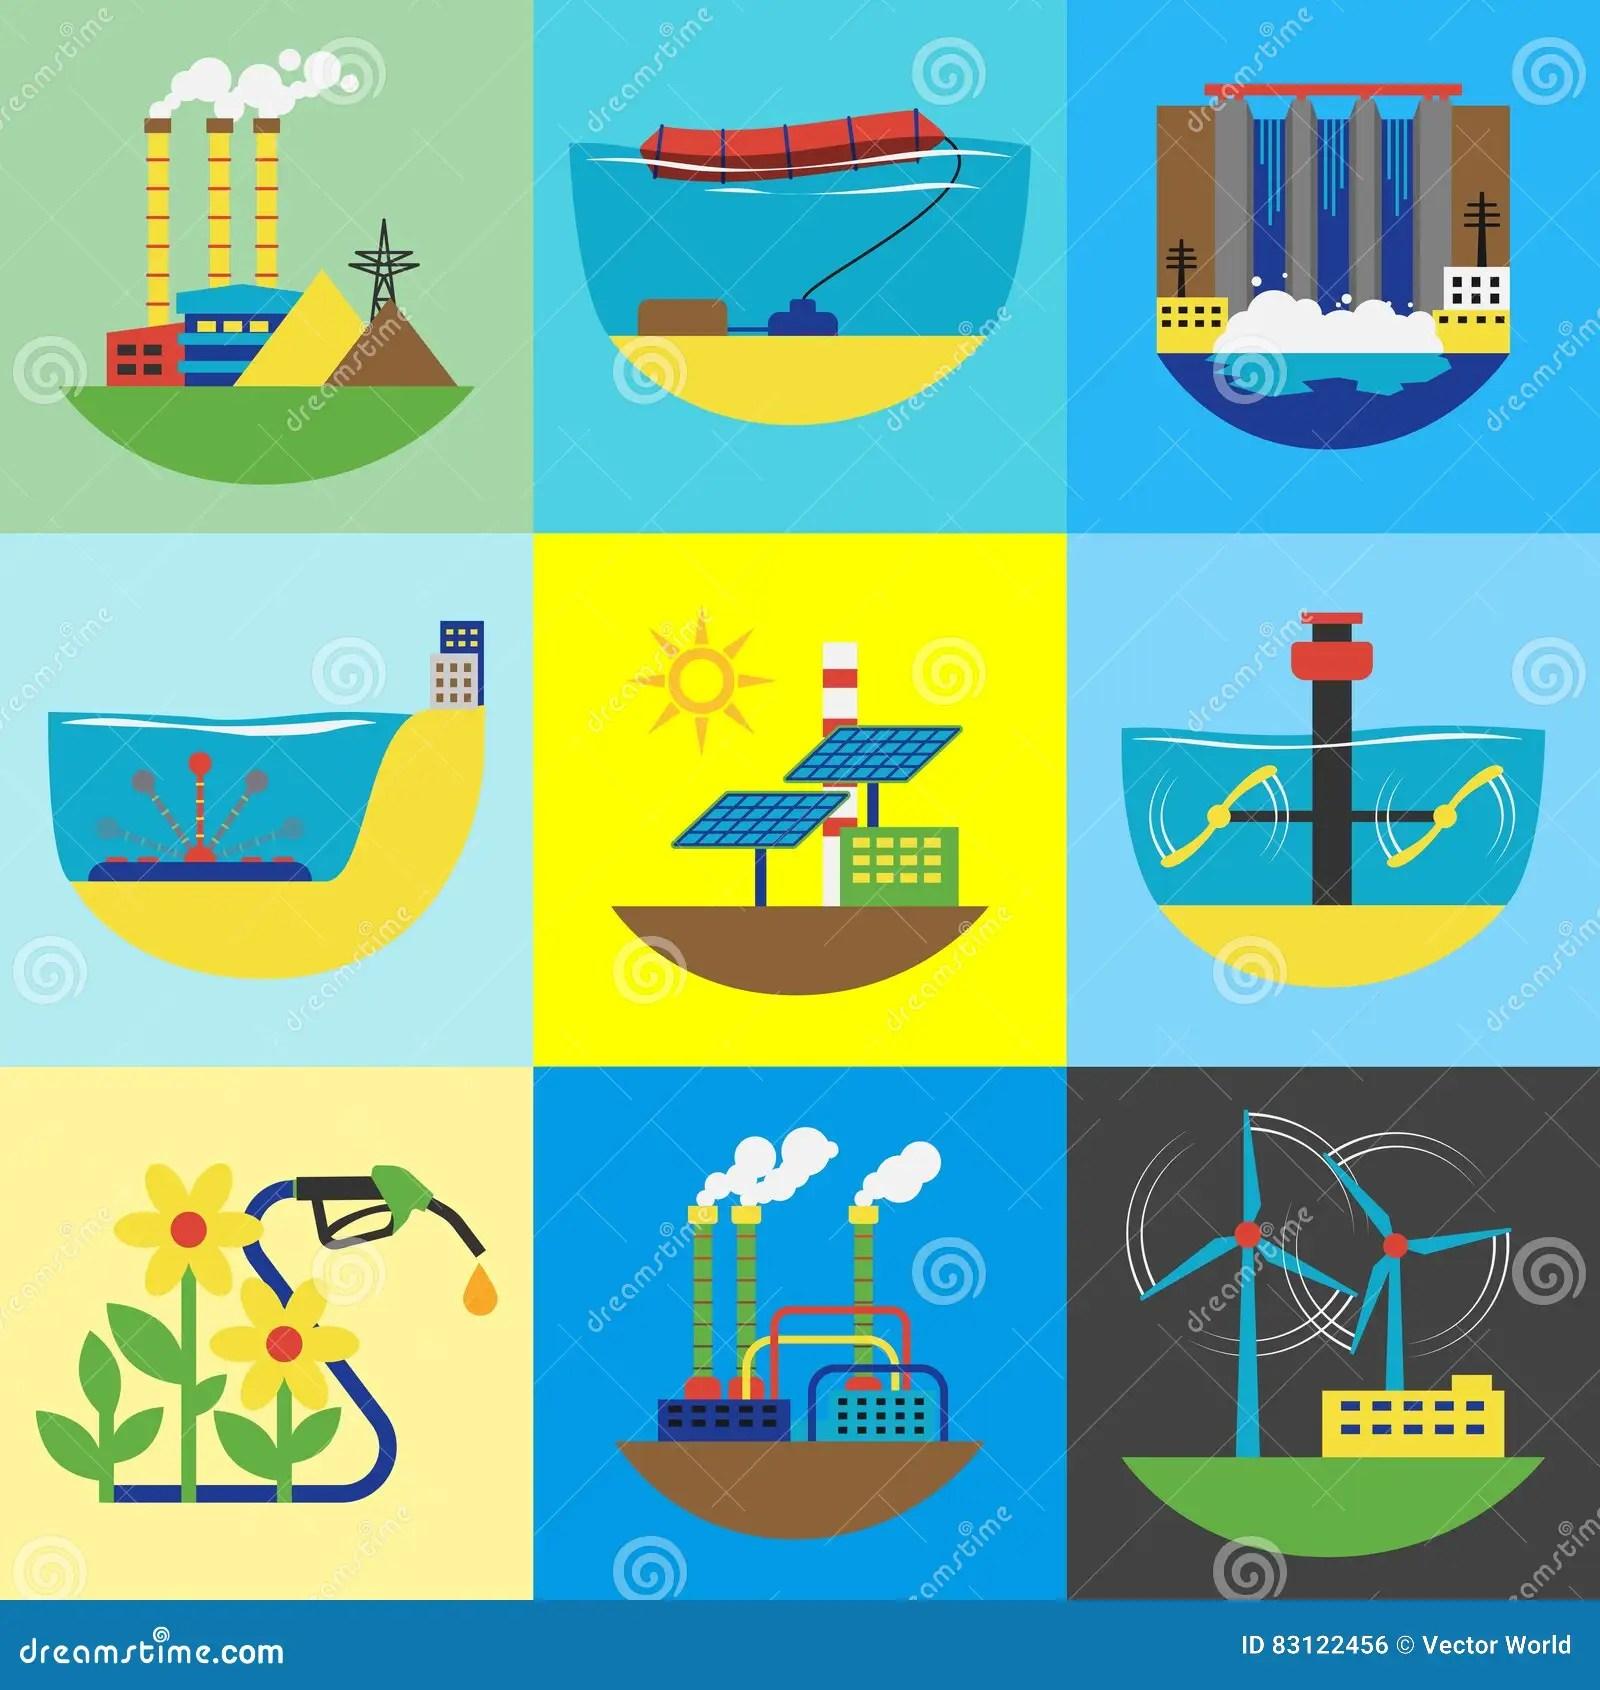 Alternative Energy Source Set Vector Illustration Stock